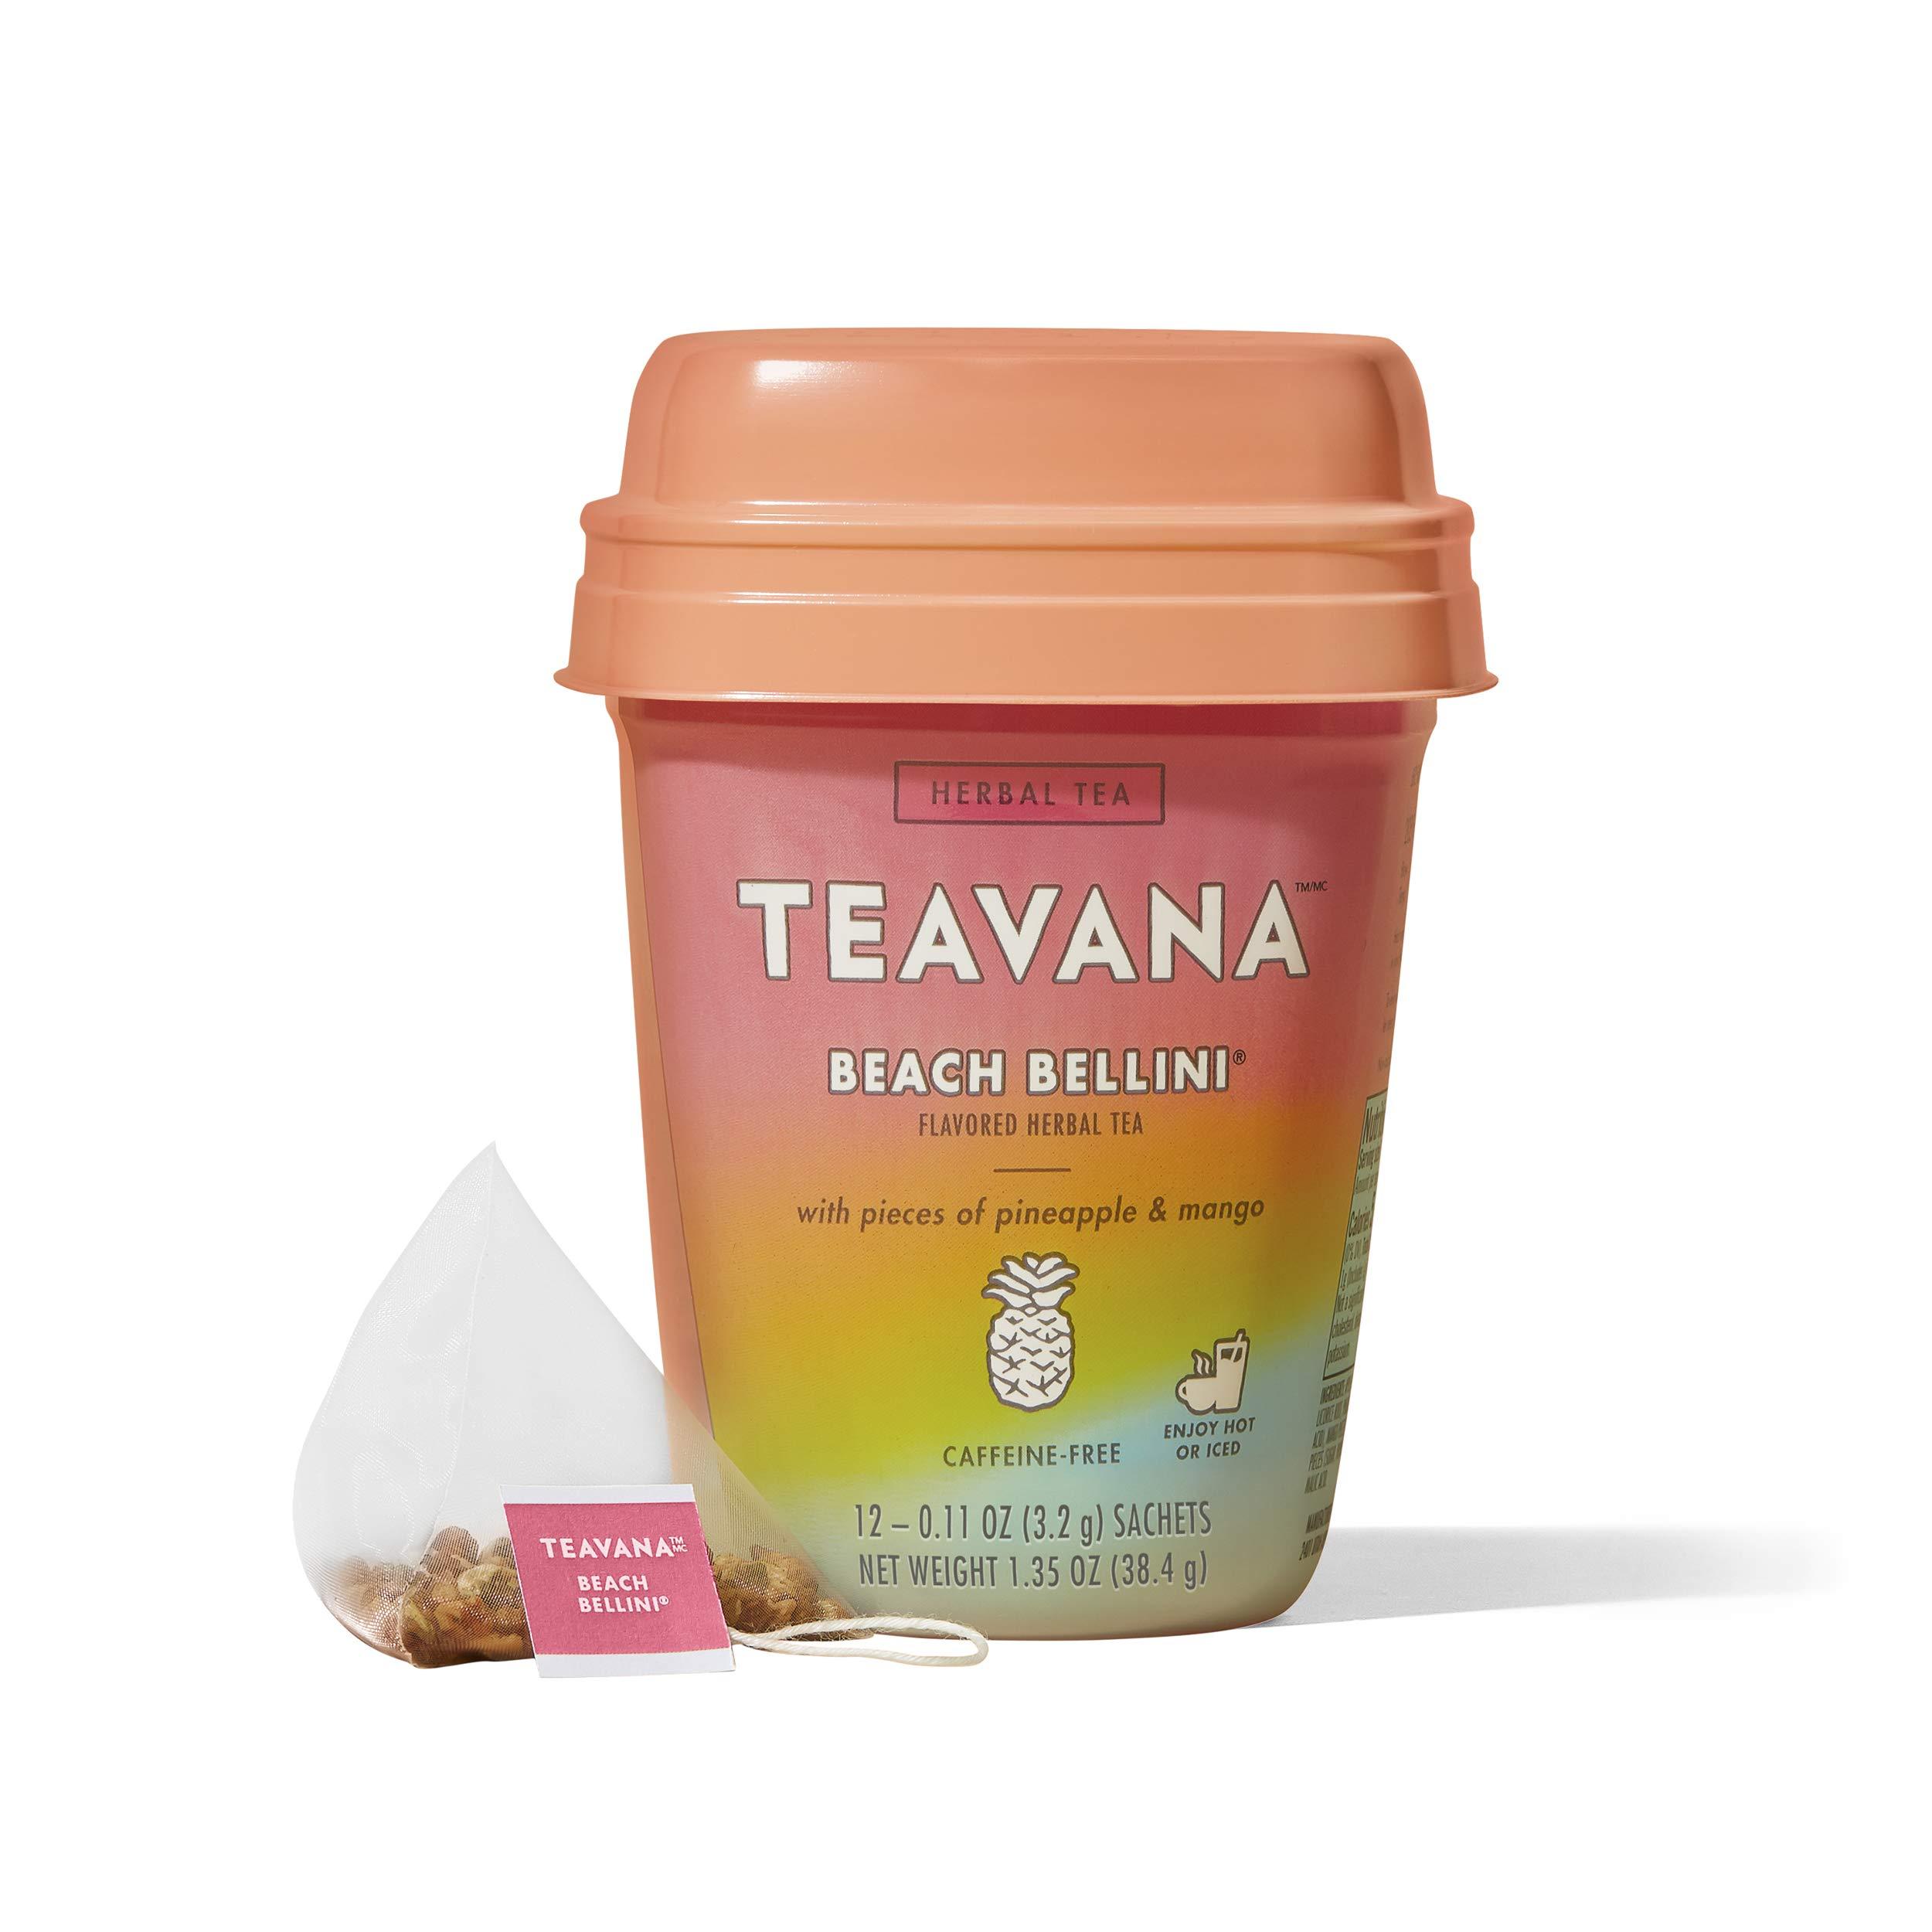 Teavana Beach Bellini, Herbal Tea WithPiece of Pineapple & Mango, 48Count (4 Pack of 12 sachets)